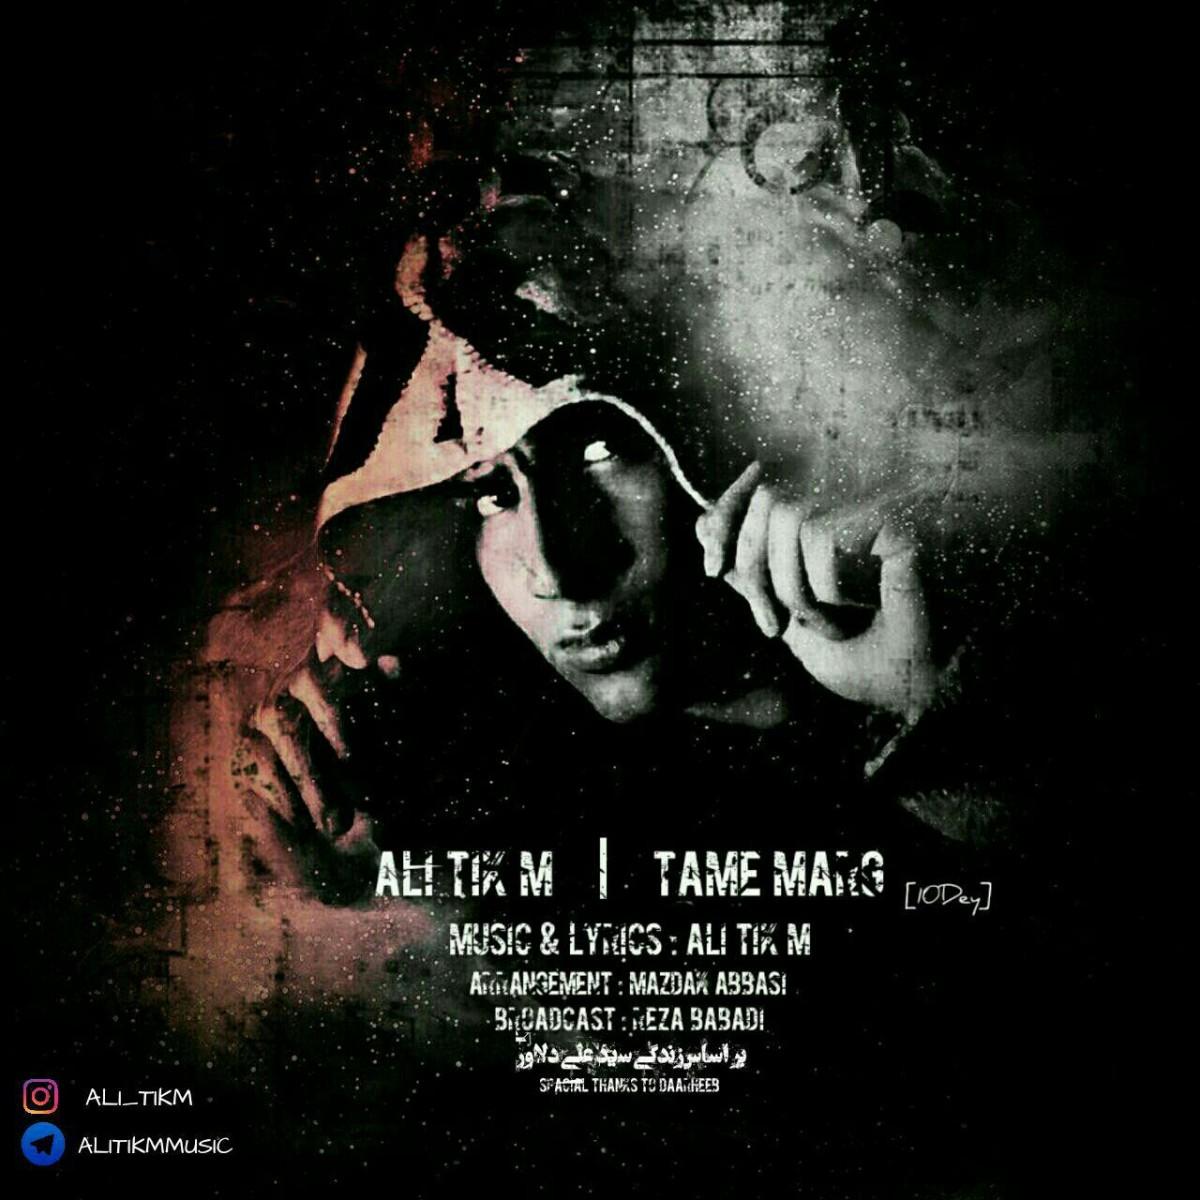 Ali Tik M – Tame Marg